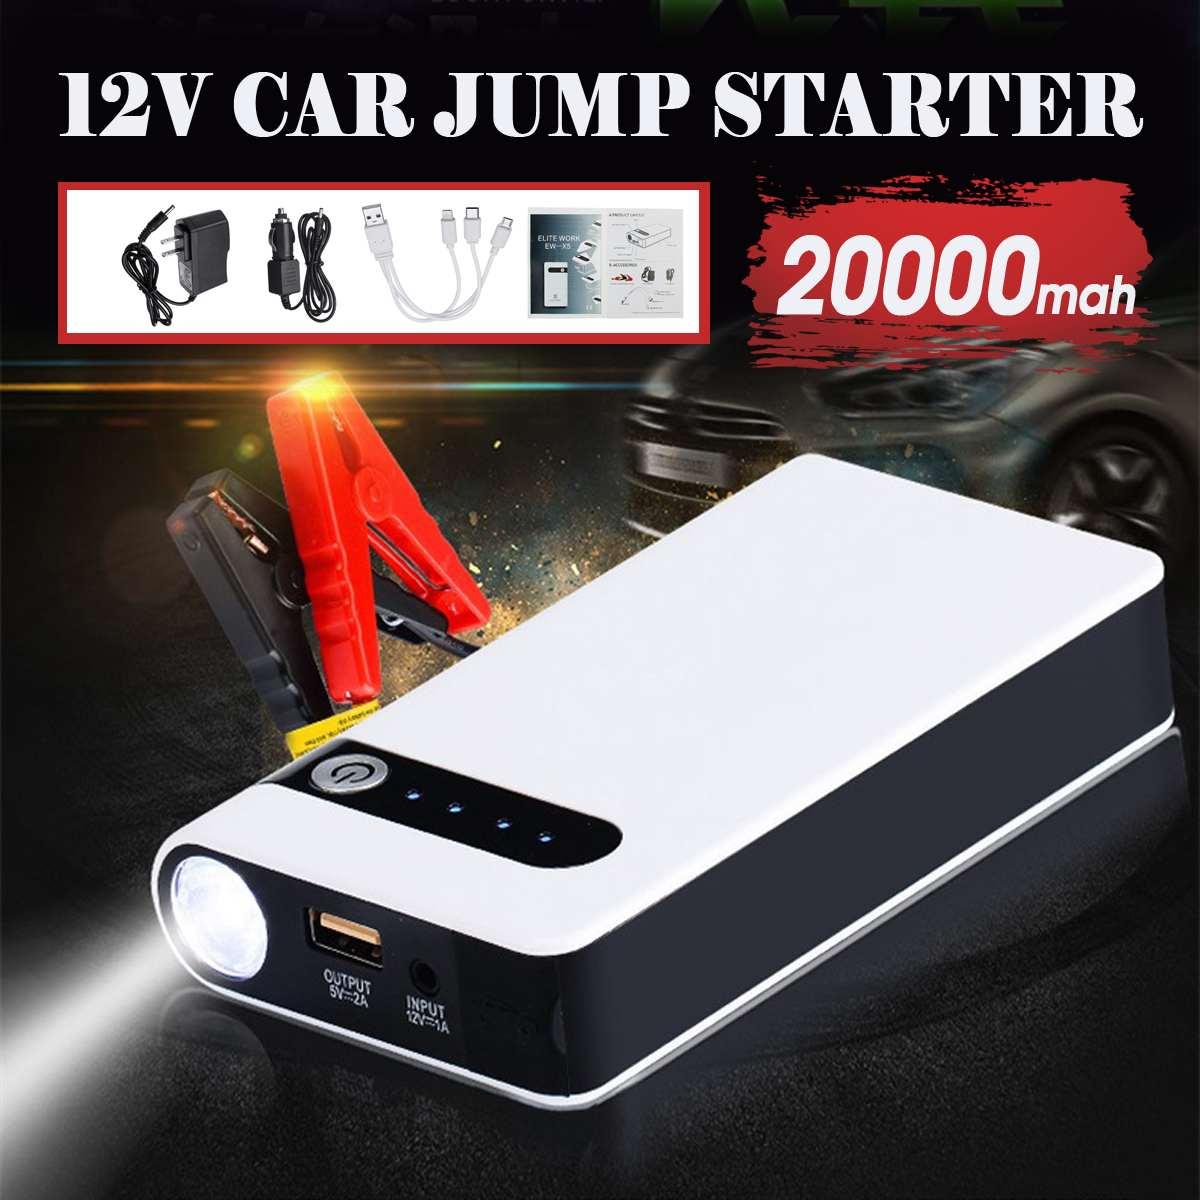 12V 20000 10000mah 車のジャンプスターターブースター USB ジャンパーボックス電源銀行バッテリ充電器緊急始動装置